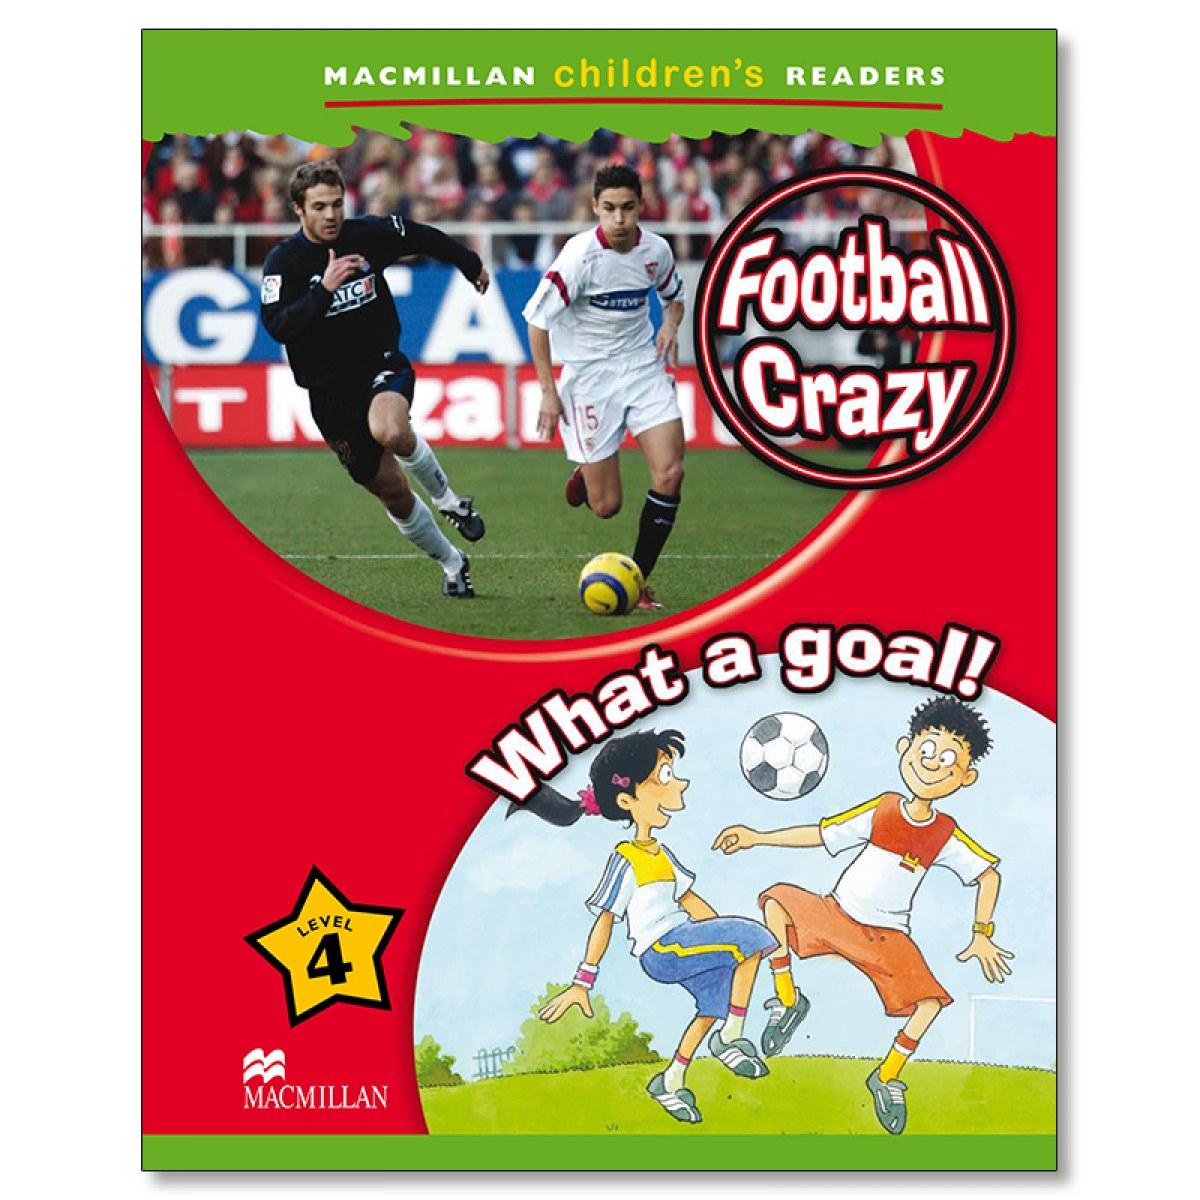 Football crazy / What a goal! 9780230010161